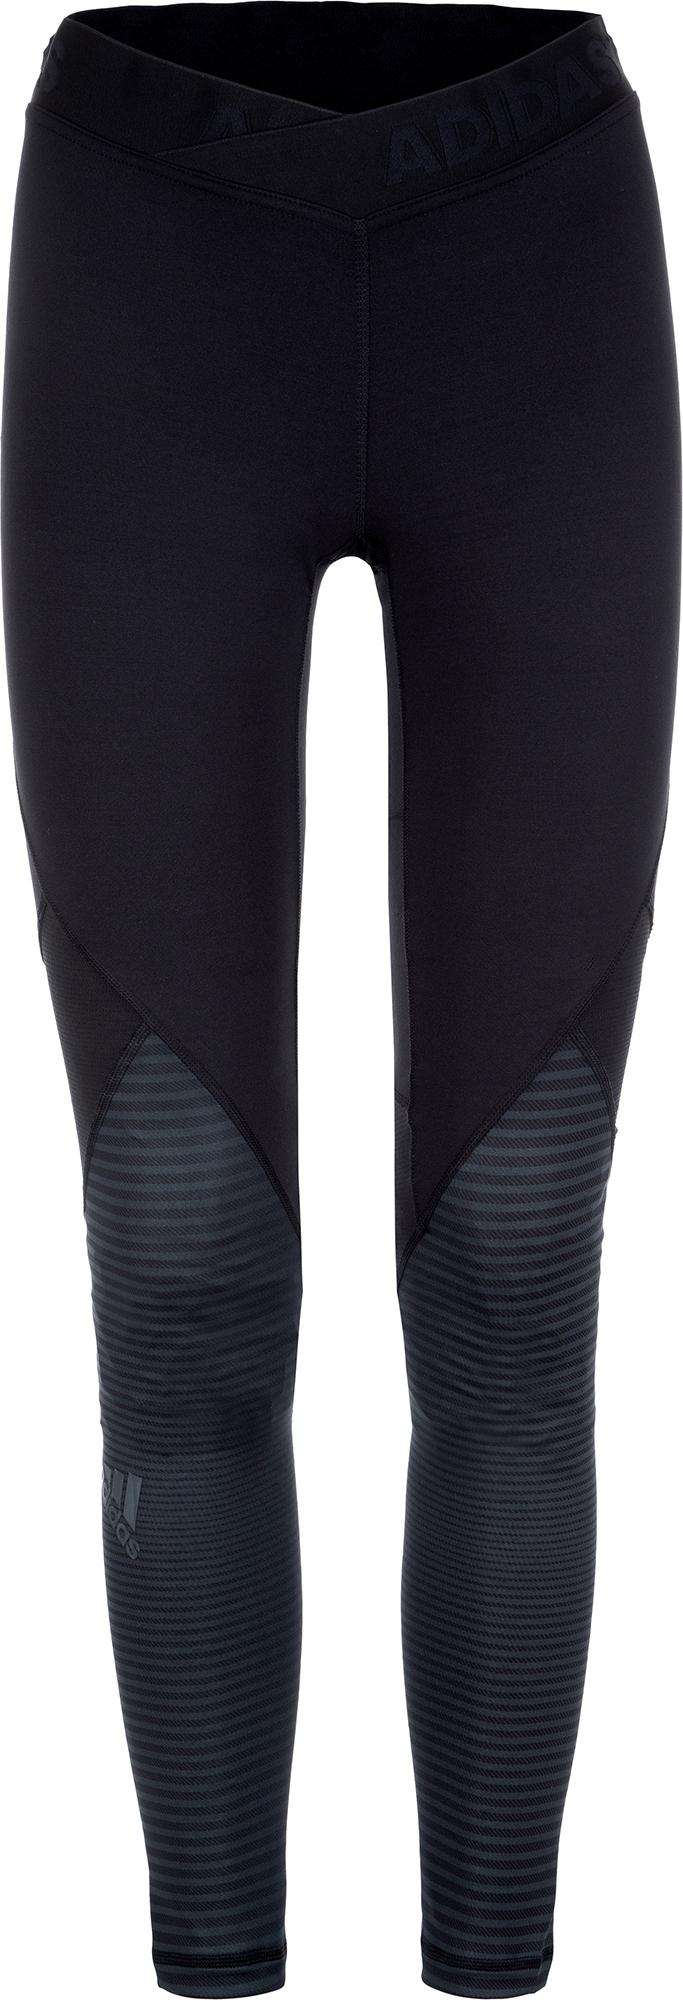 Adidas Легинсы женские Adidas Alphaskin Sport Climawarm, размер 46-48